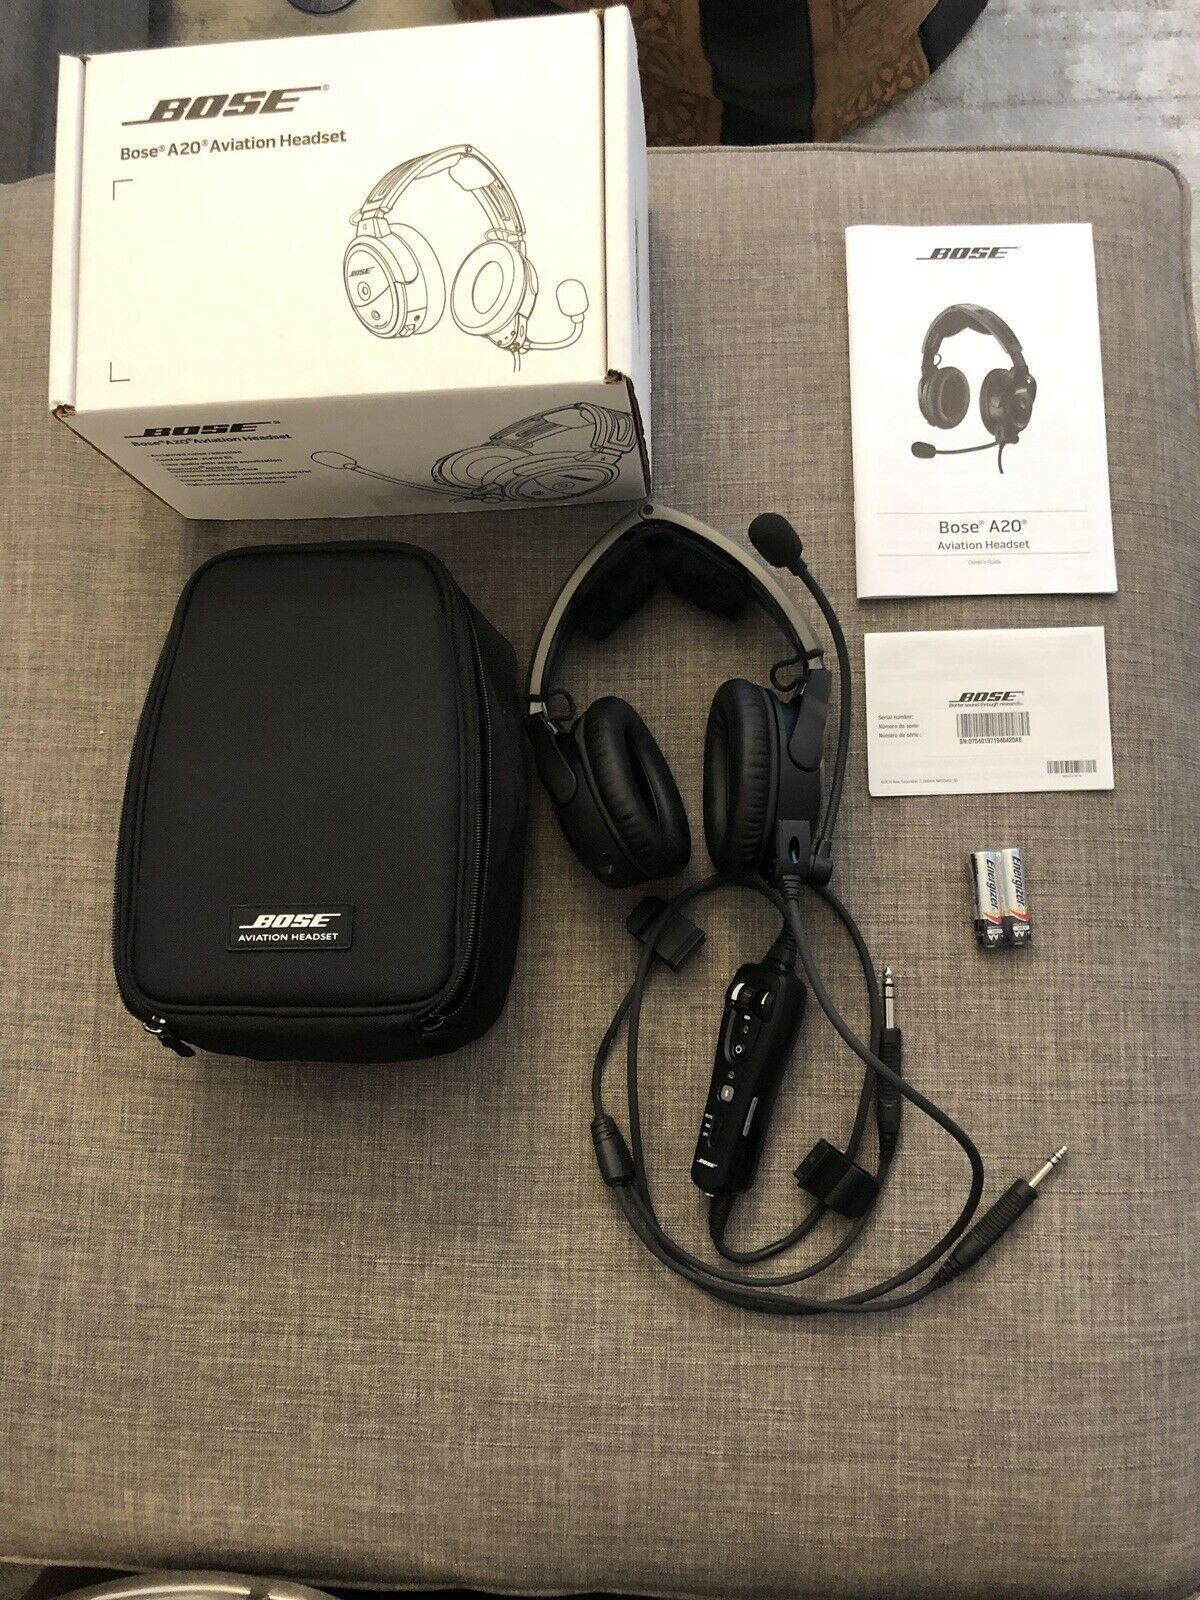 Bose A20 Bluetooth Aviation Headset With Dual GA Plug